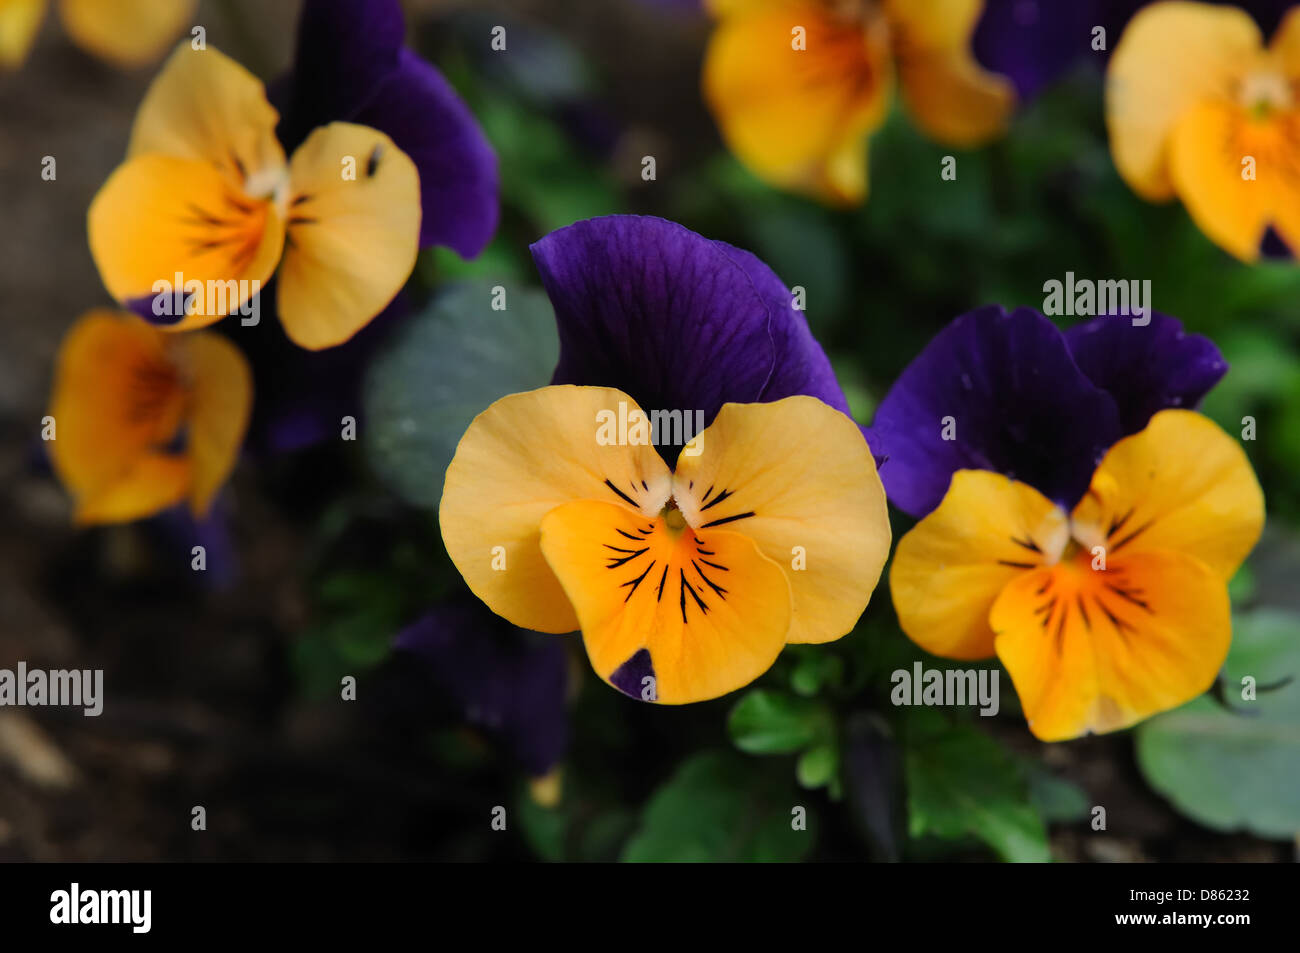 Viola - Horned Violet, Tufted Pansy Sorbet Sunny Royale - Stock Image